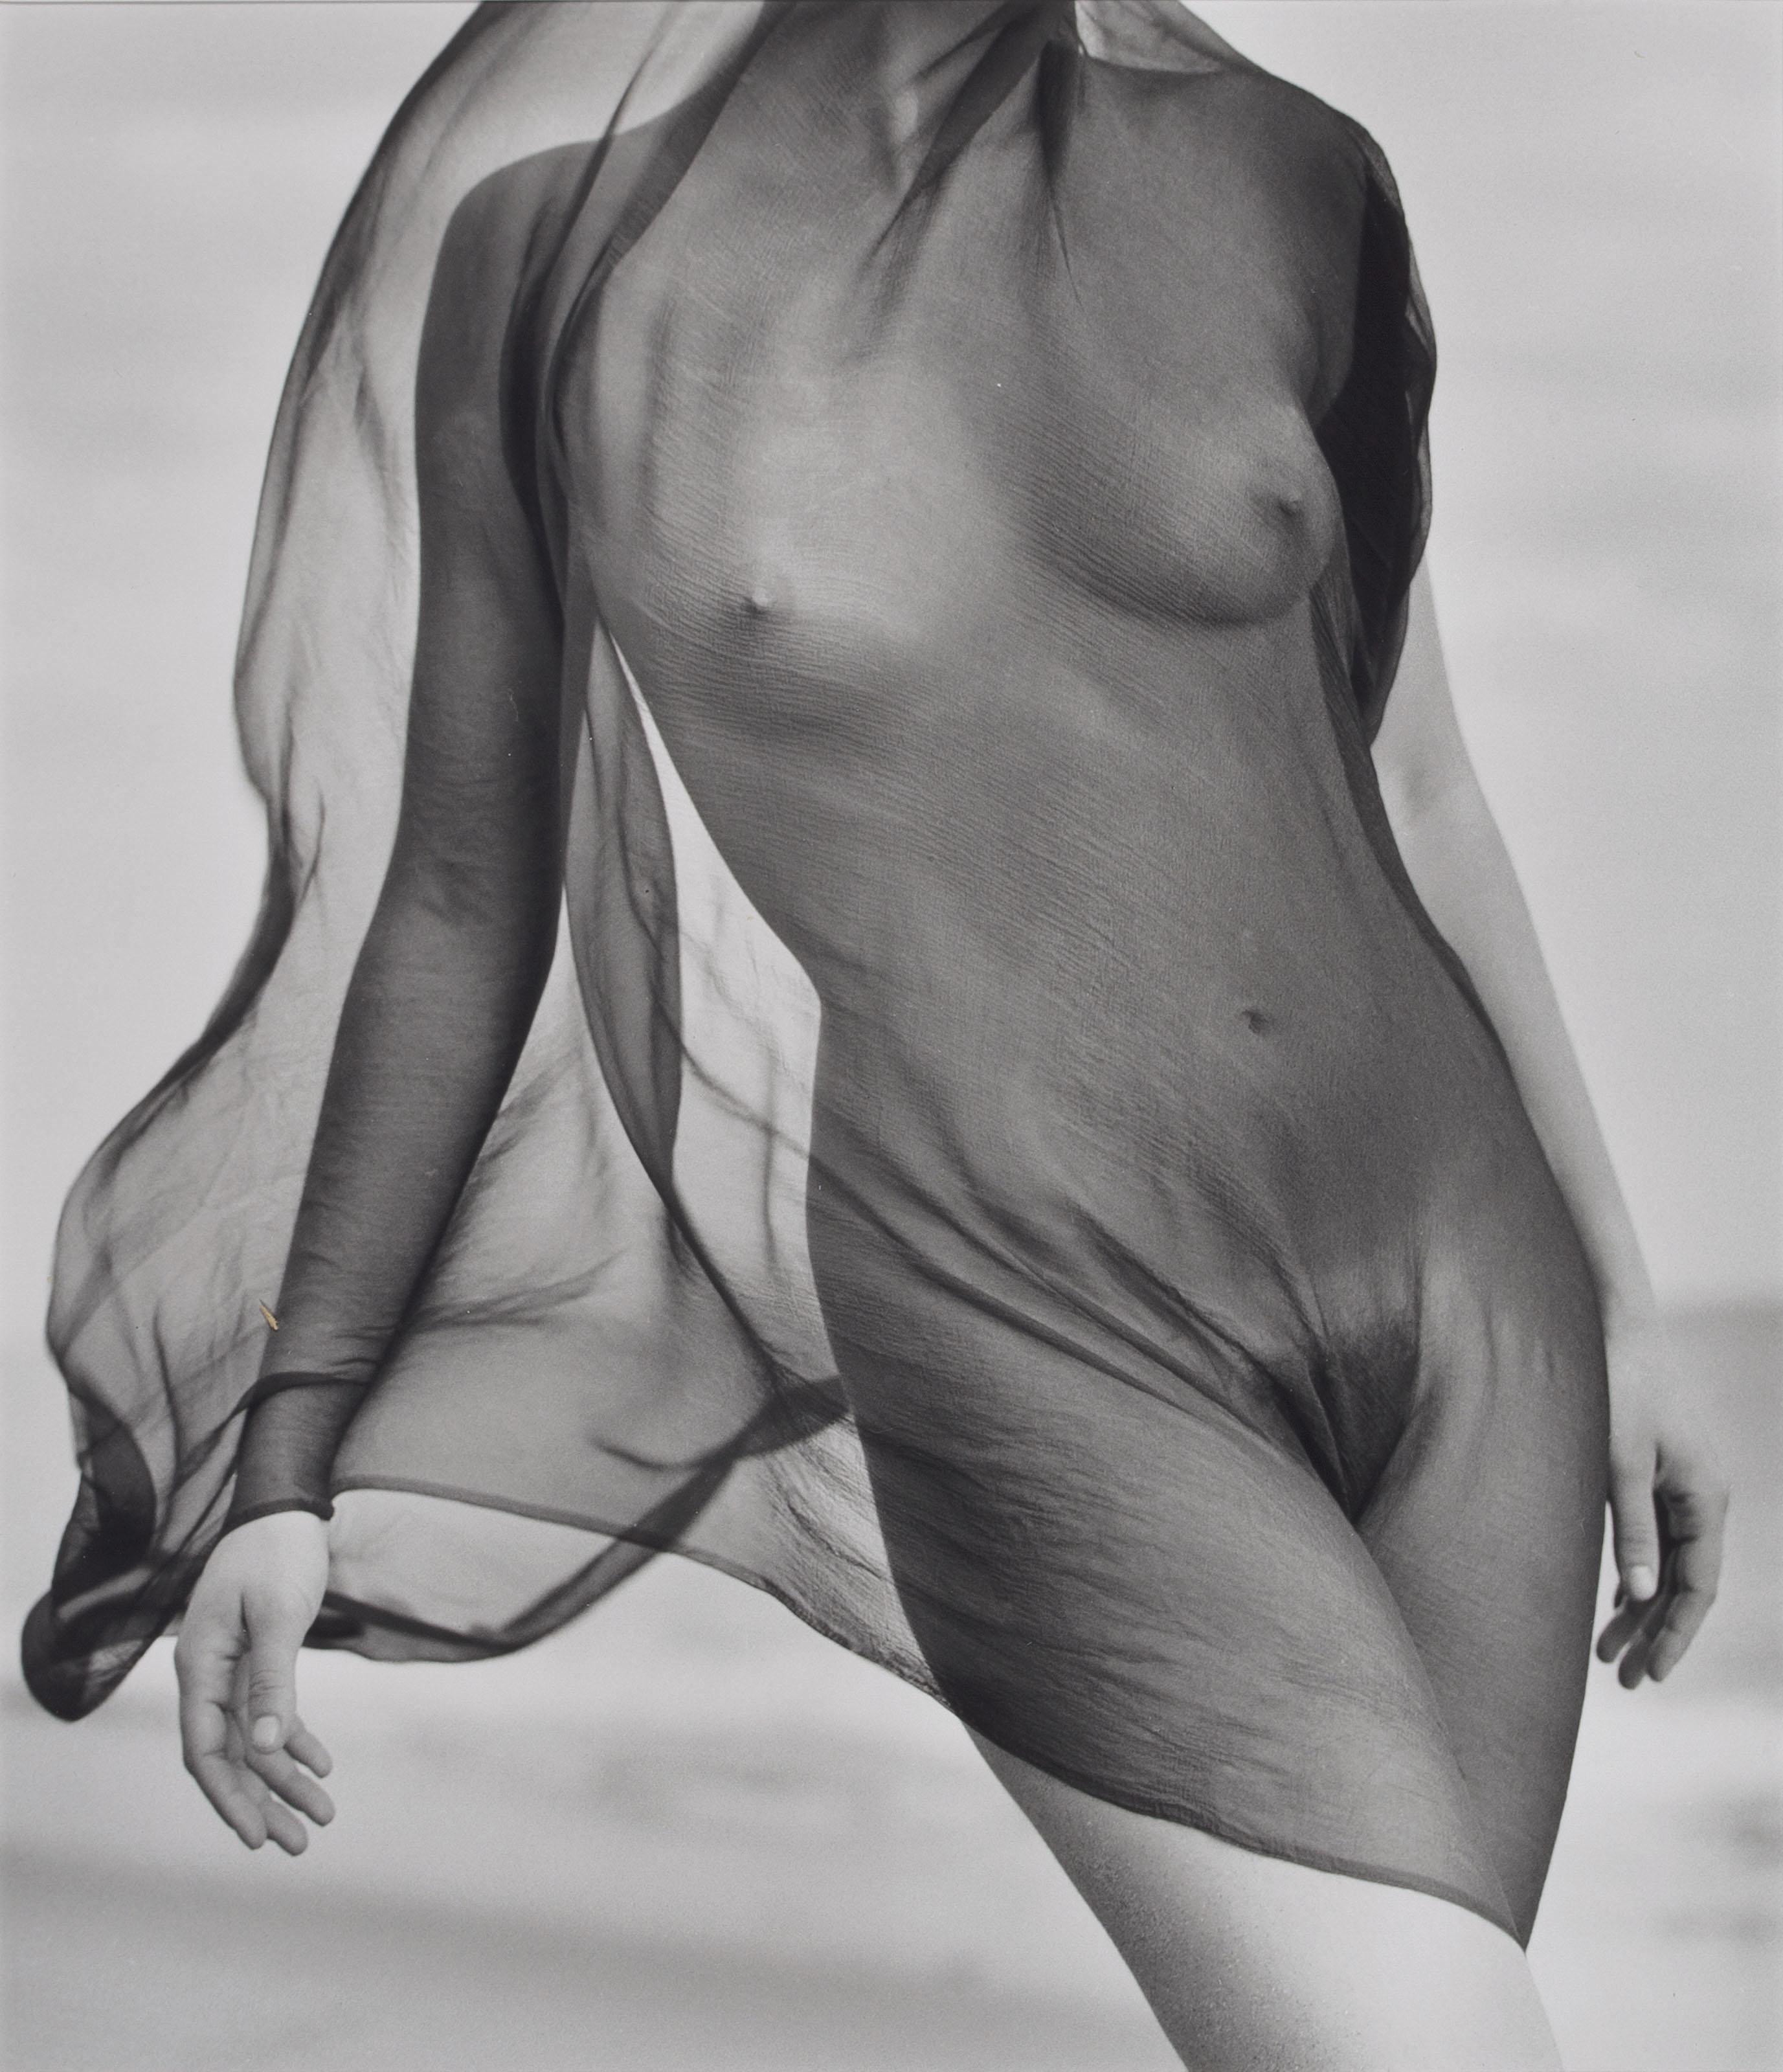 Female Torso with Veil, Paradise Cove, California, 1984